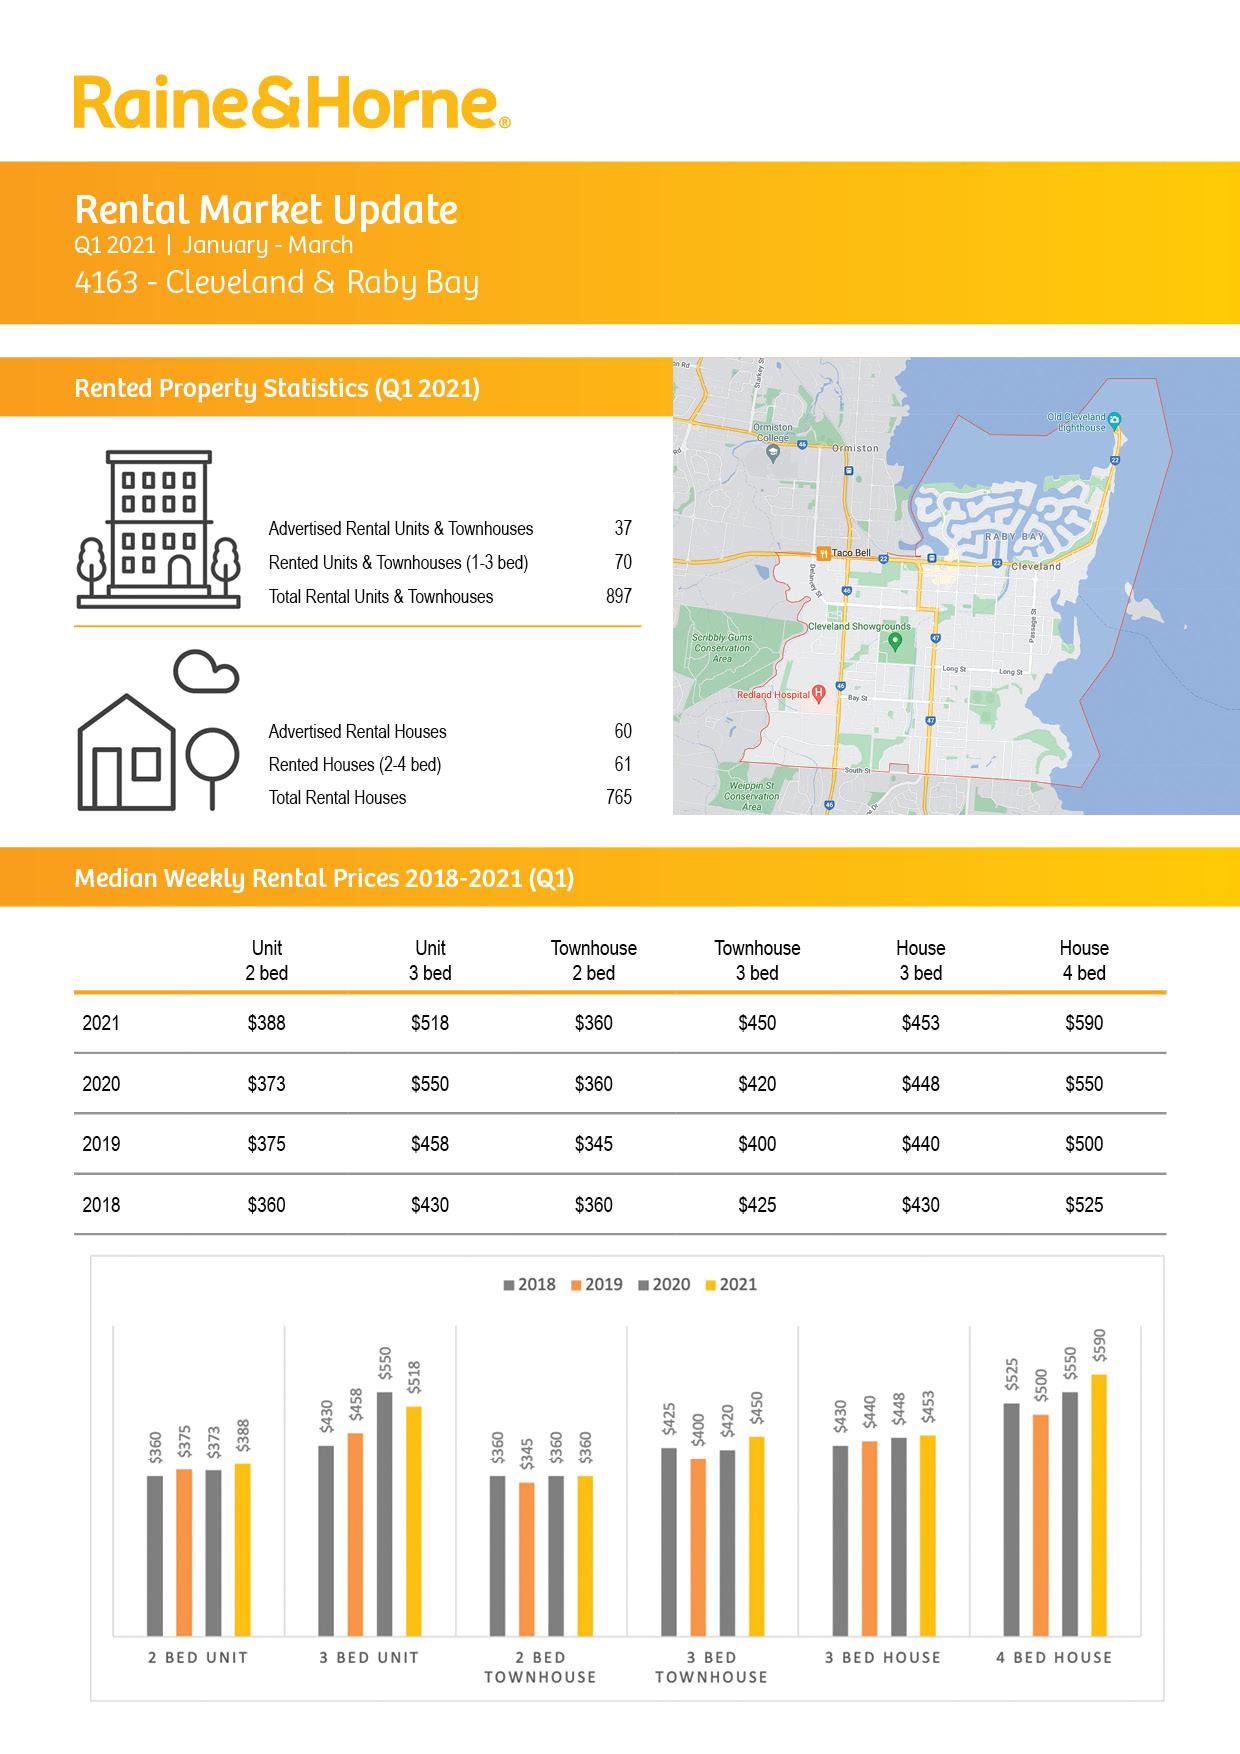 4163 Rental Market Update